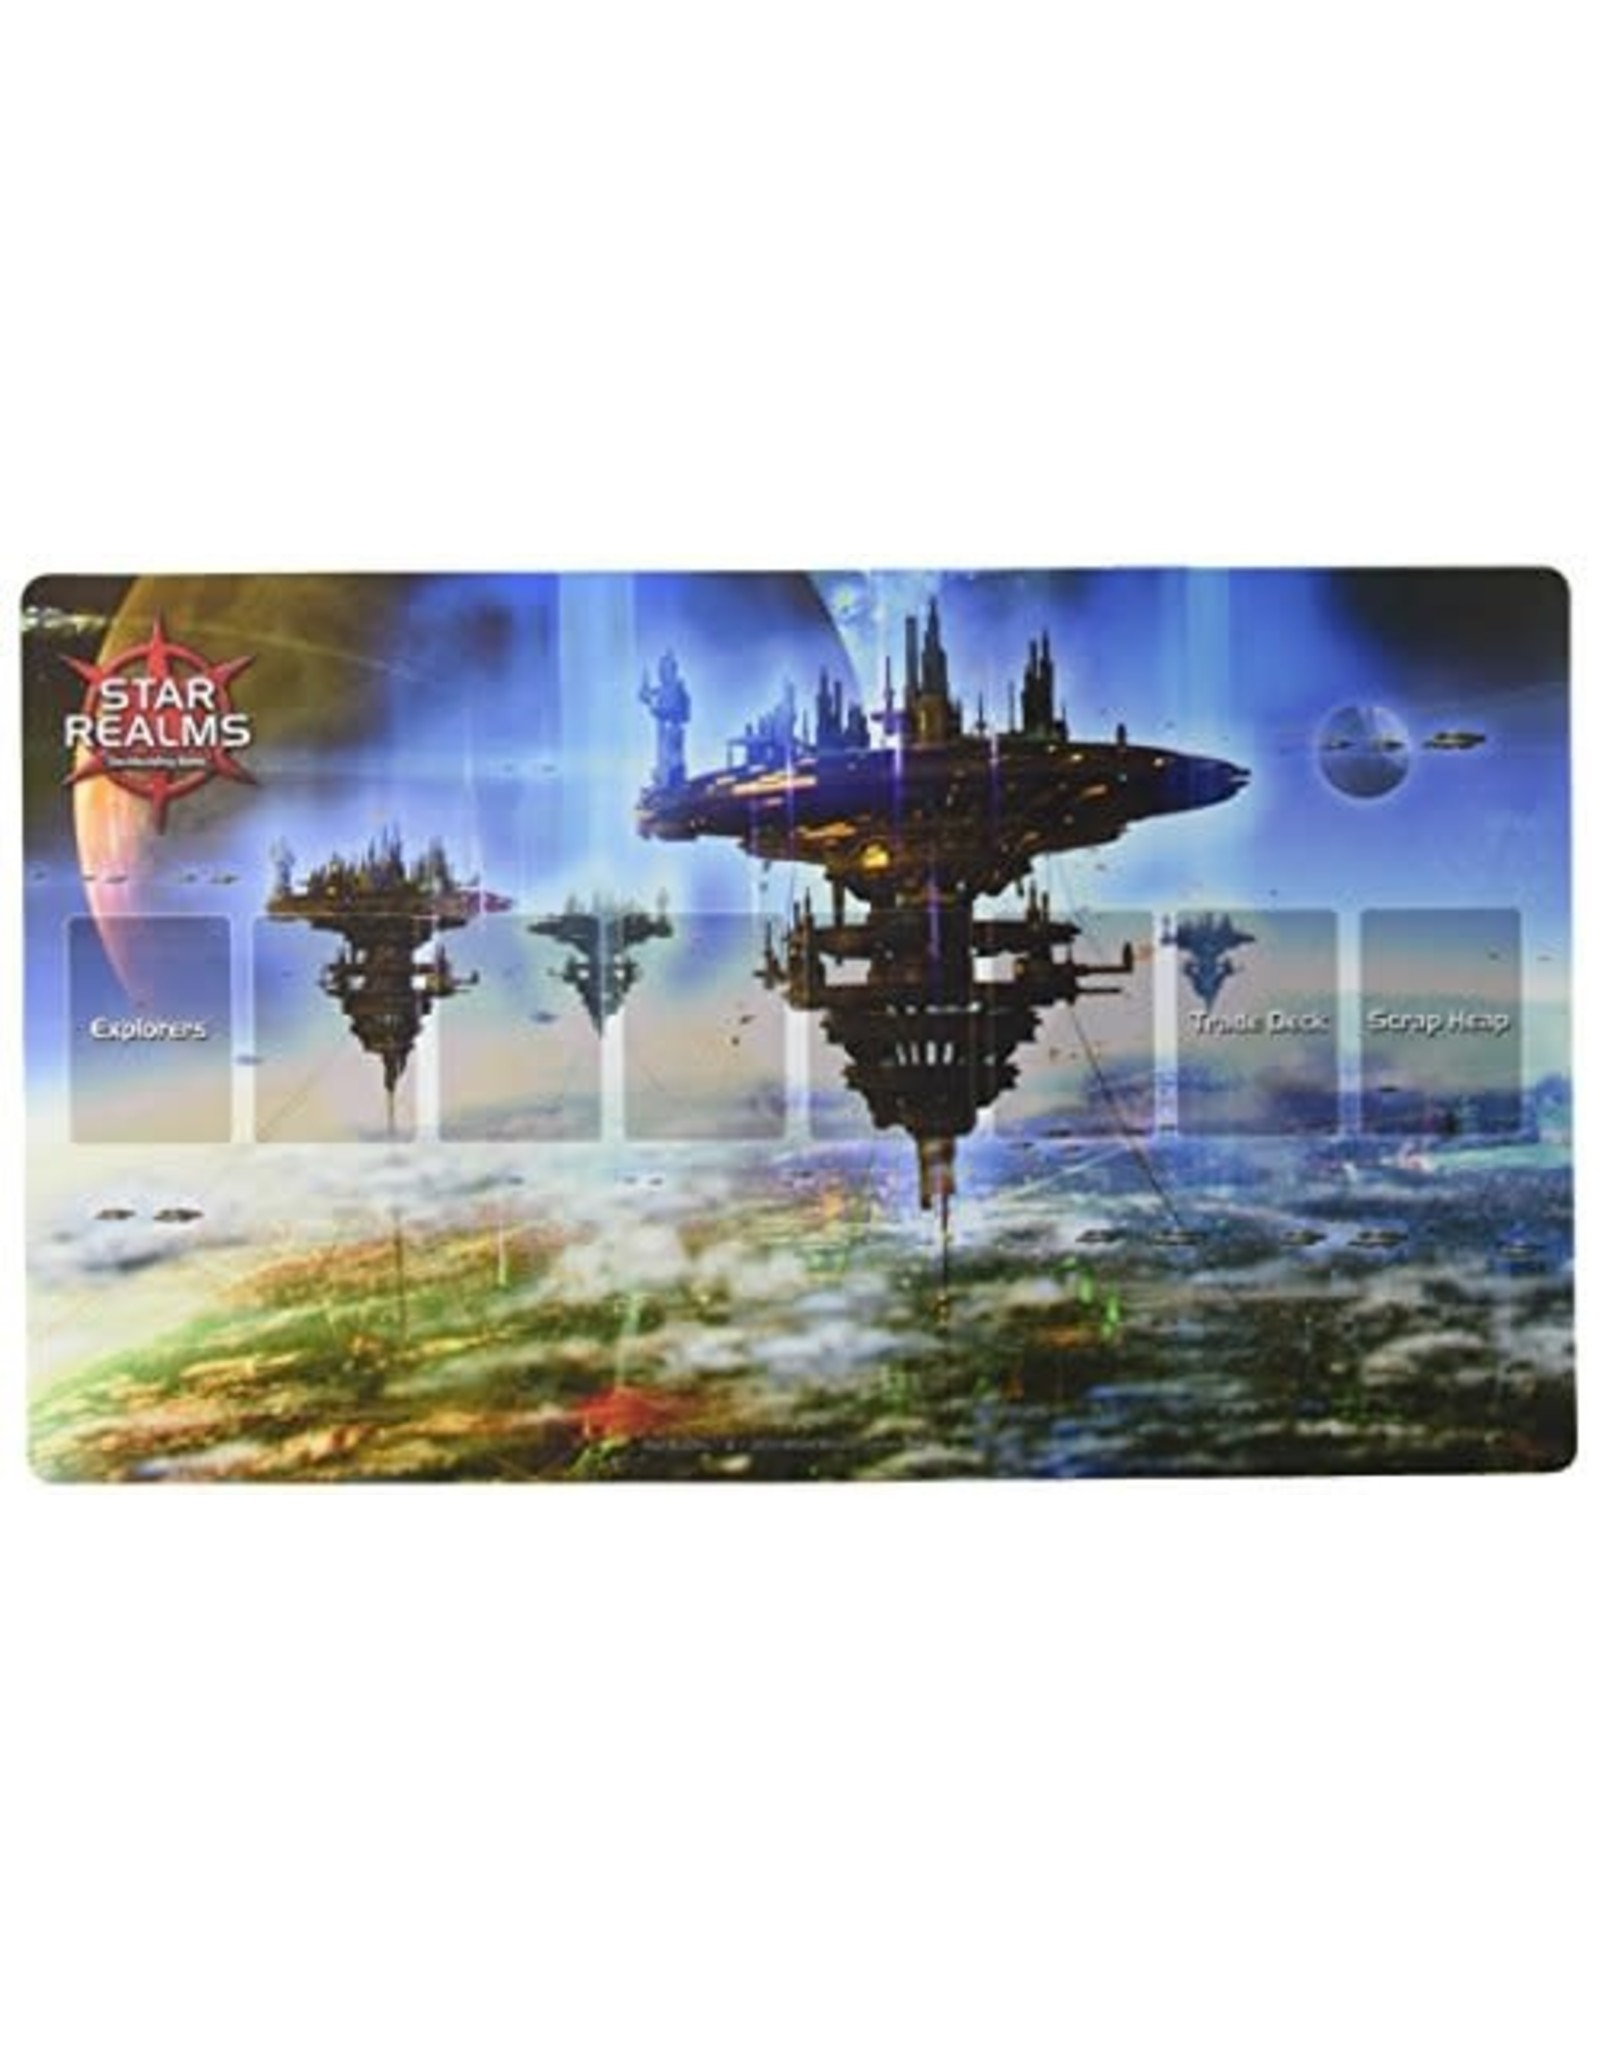 Star Realms Capital World Playmat